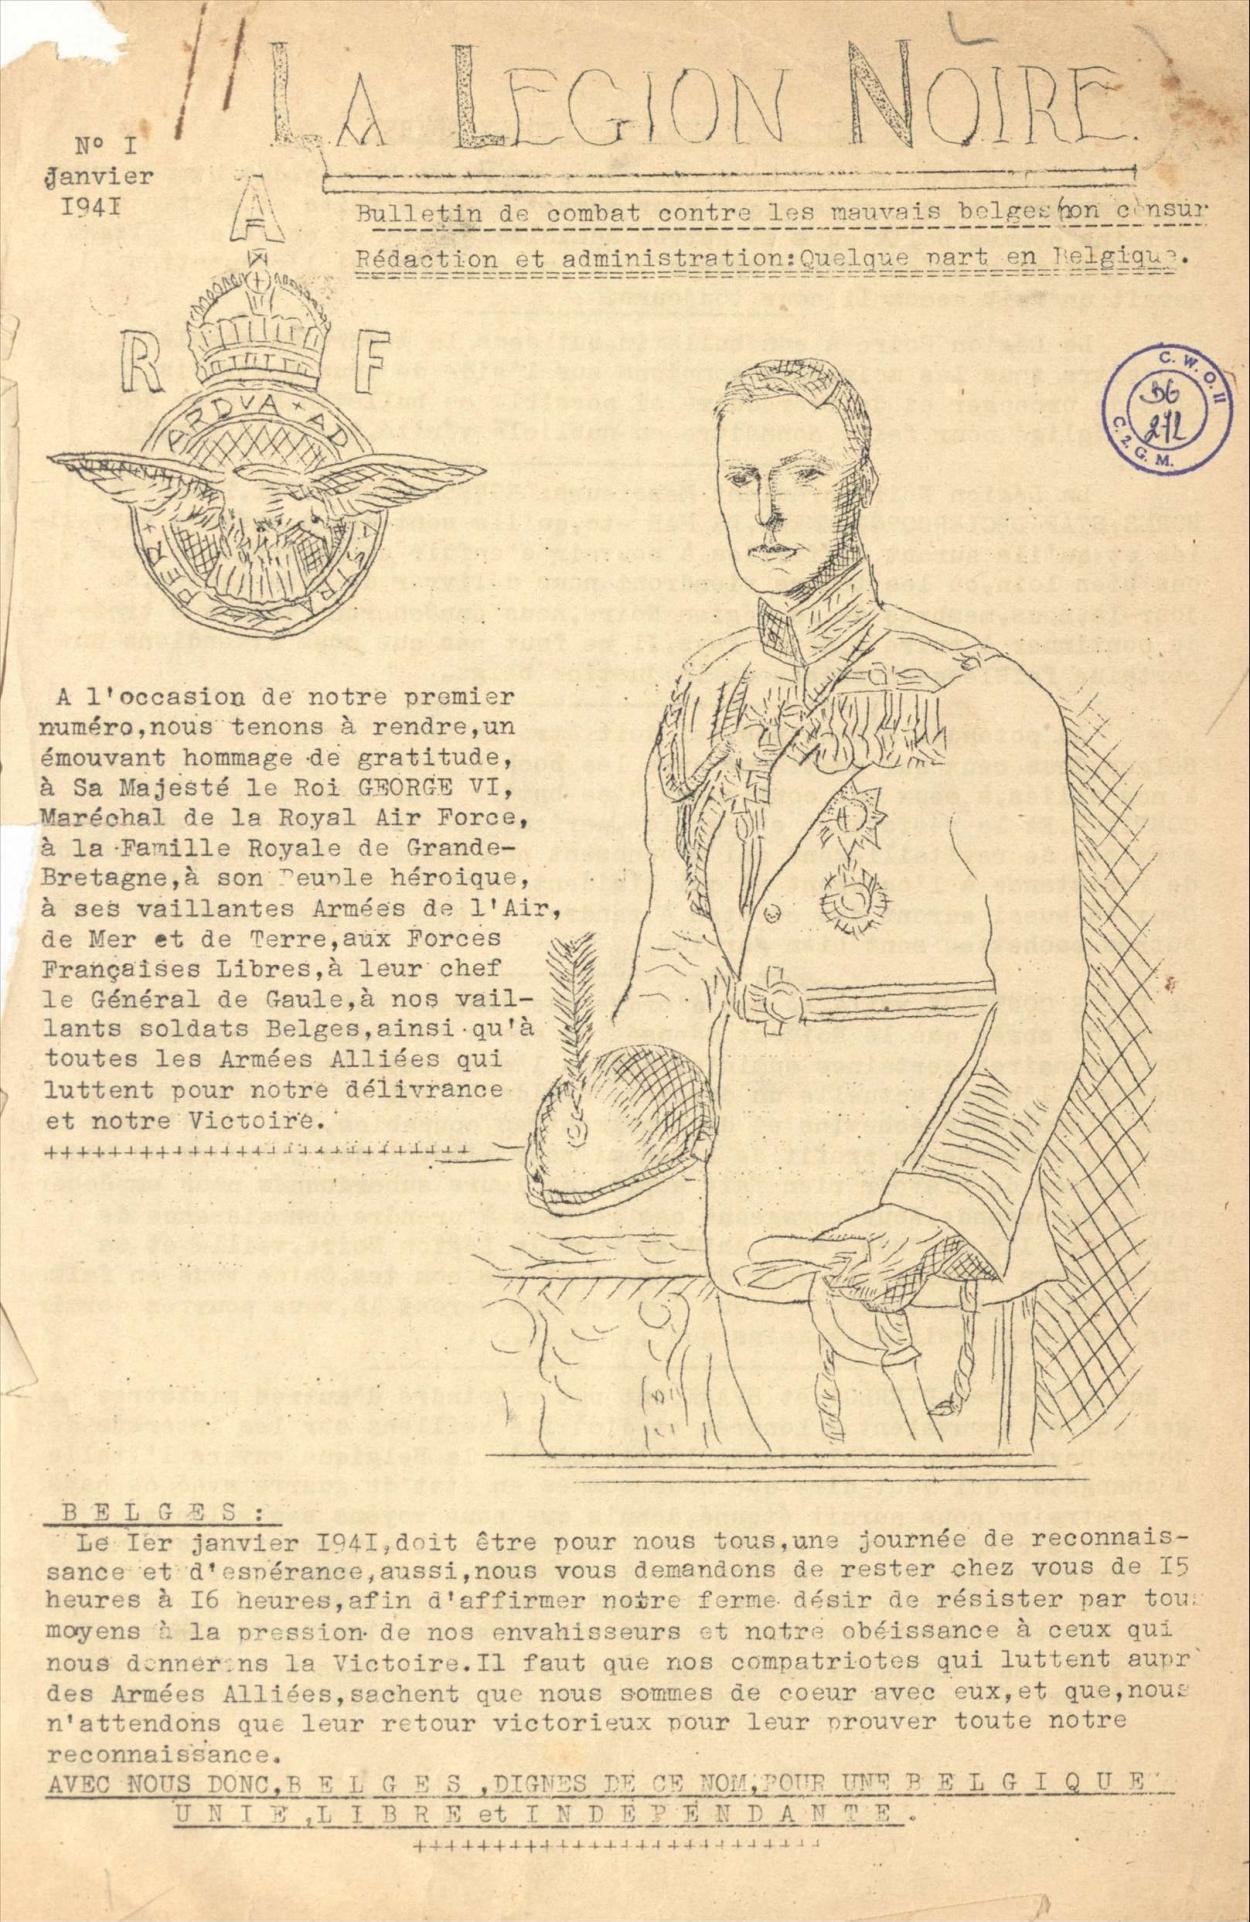 soma_bg272_1941-01_01_001-00001-la-lAgion-noire-1-janv-1941.jpg